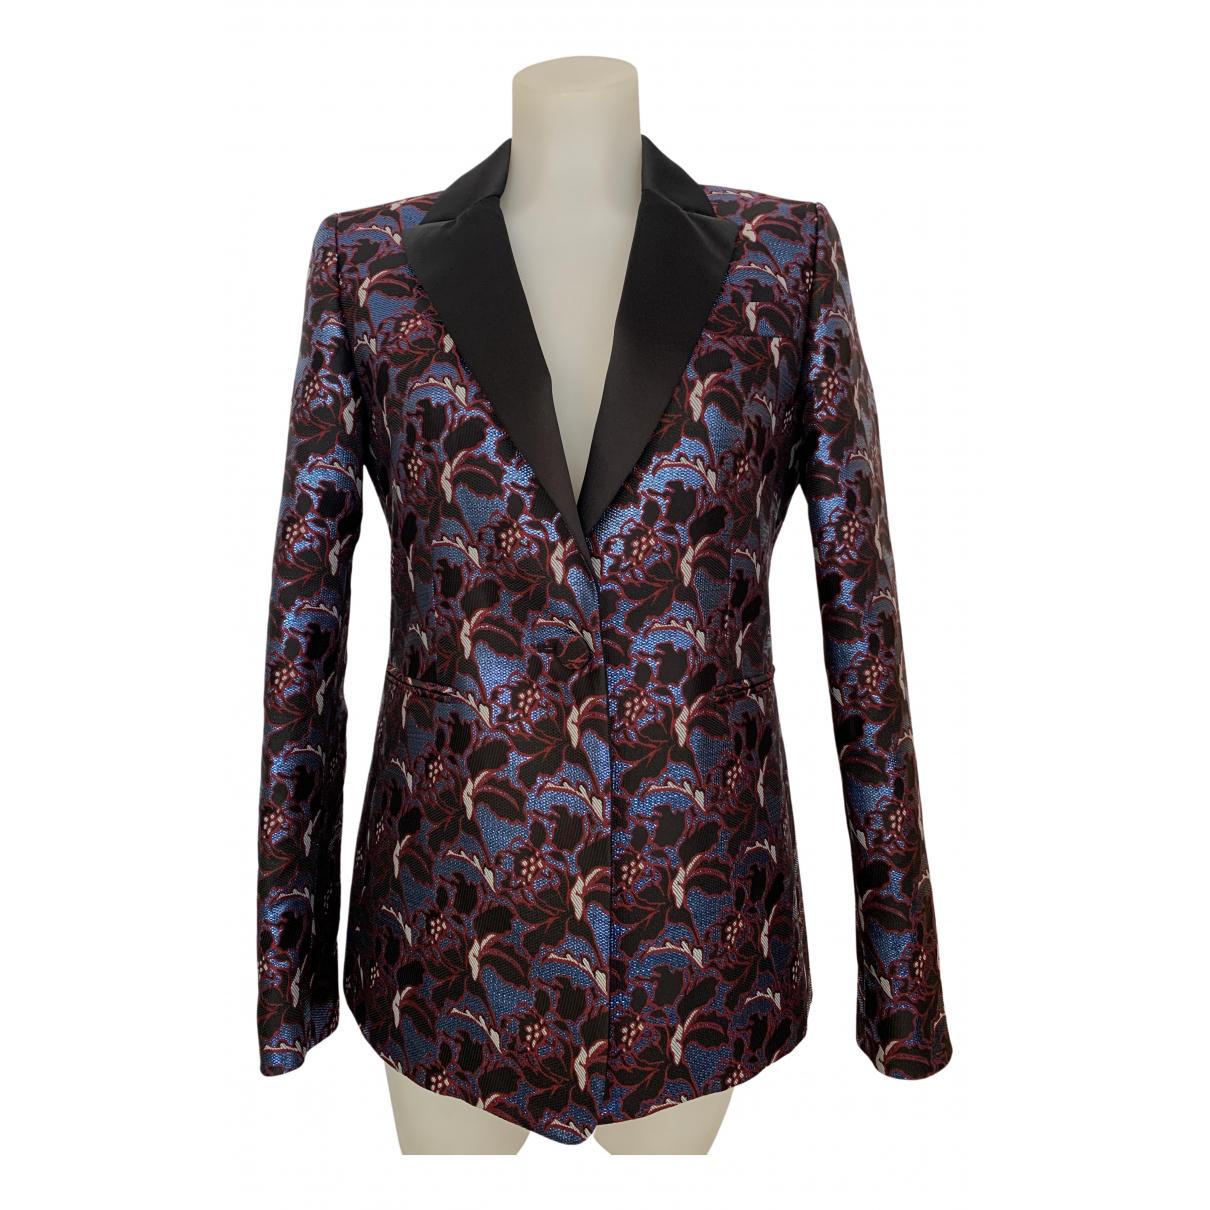 Msgm N Multicolour jacket for Women 42 IT